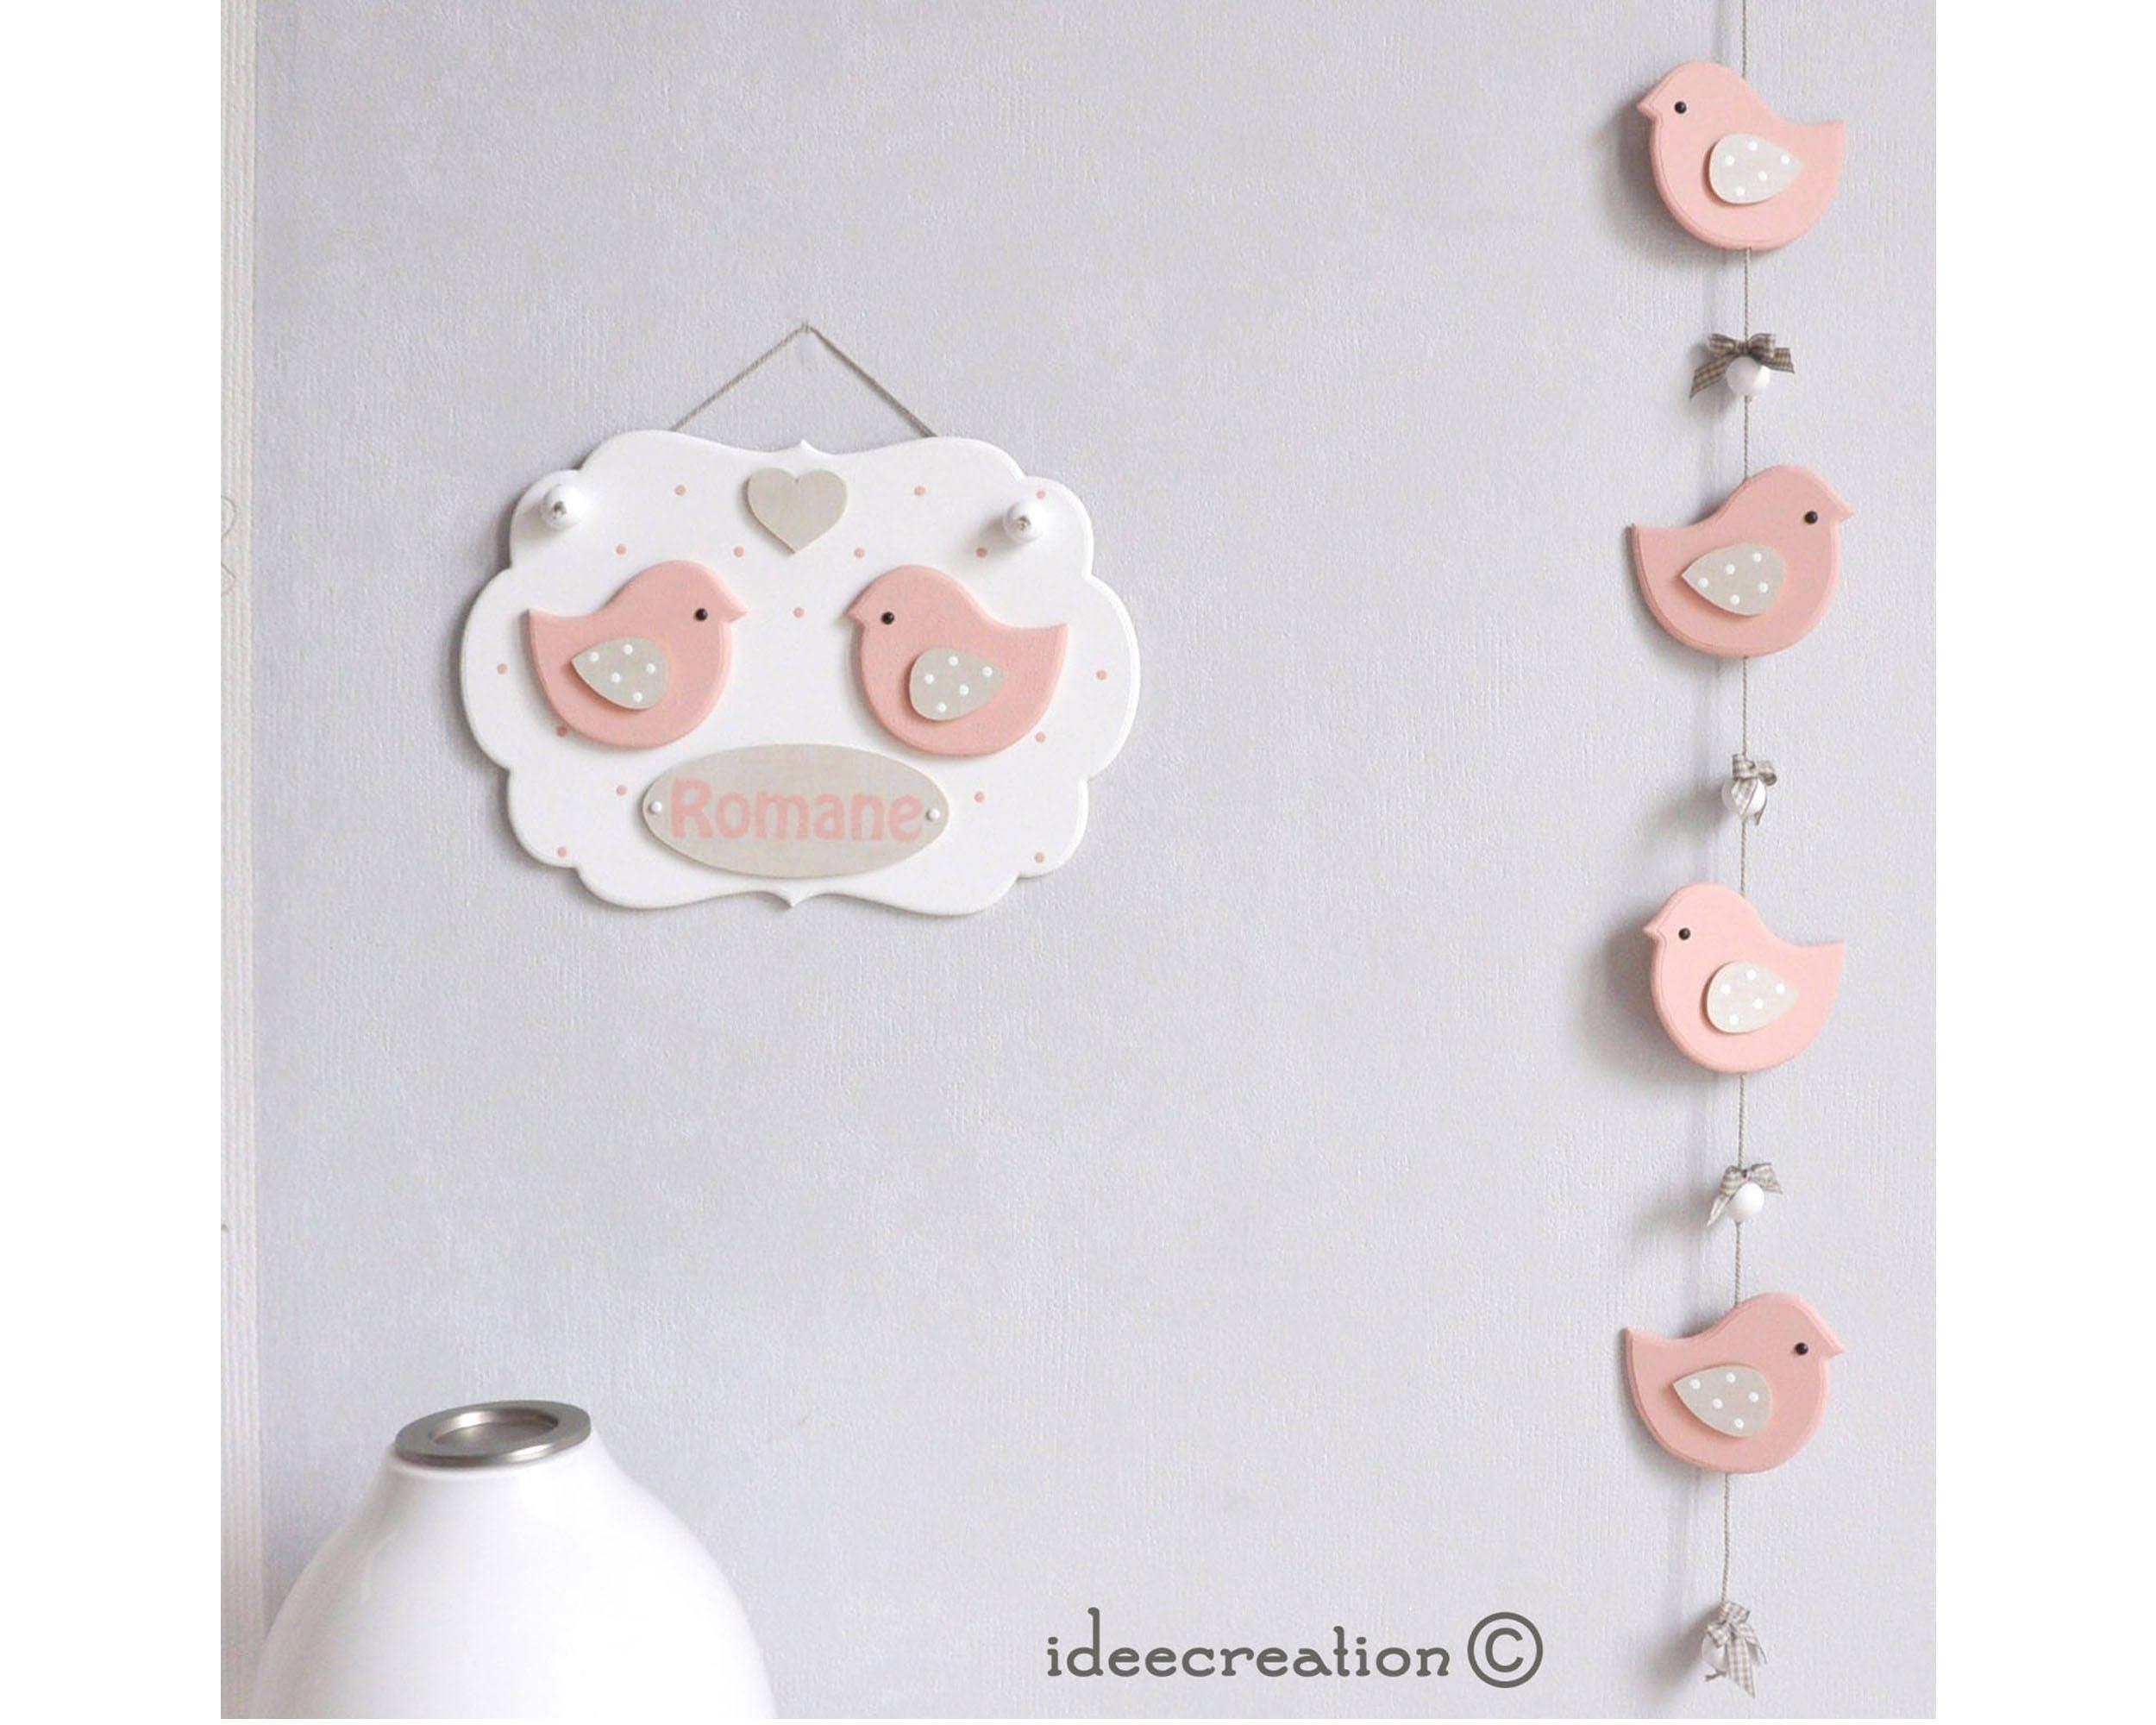 cadre pr nom b b d co oiseaux roses et guirlande pour etsy. Black Bedroom Furniture Sets. Home Design Ideas